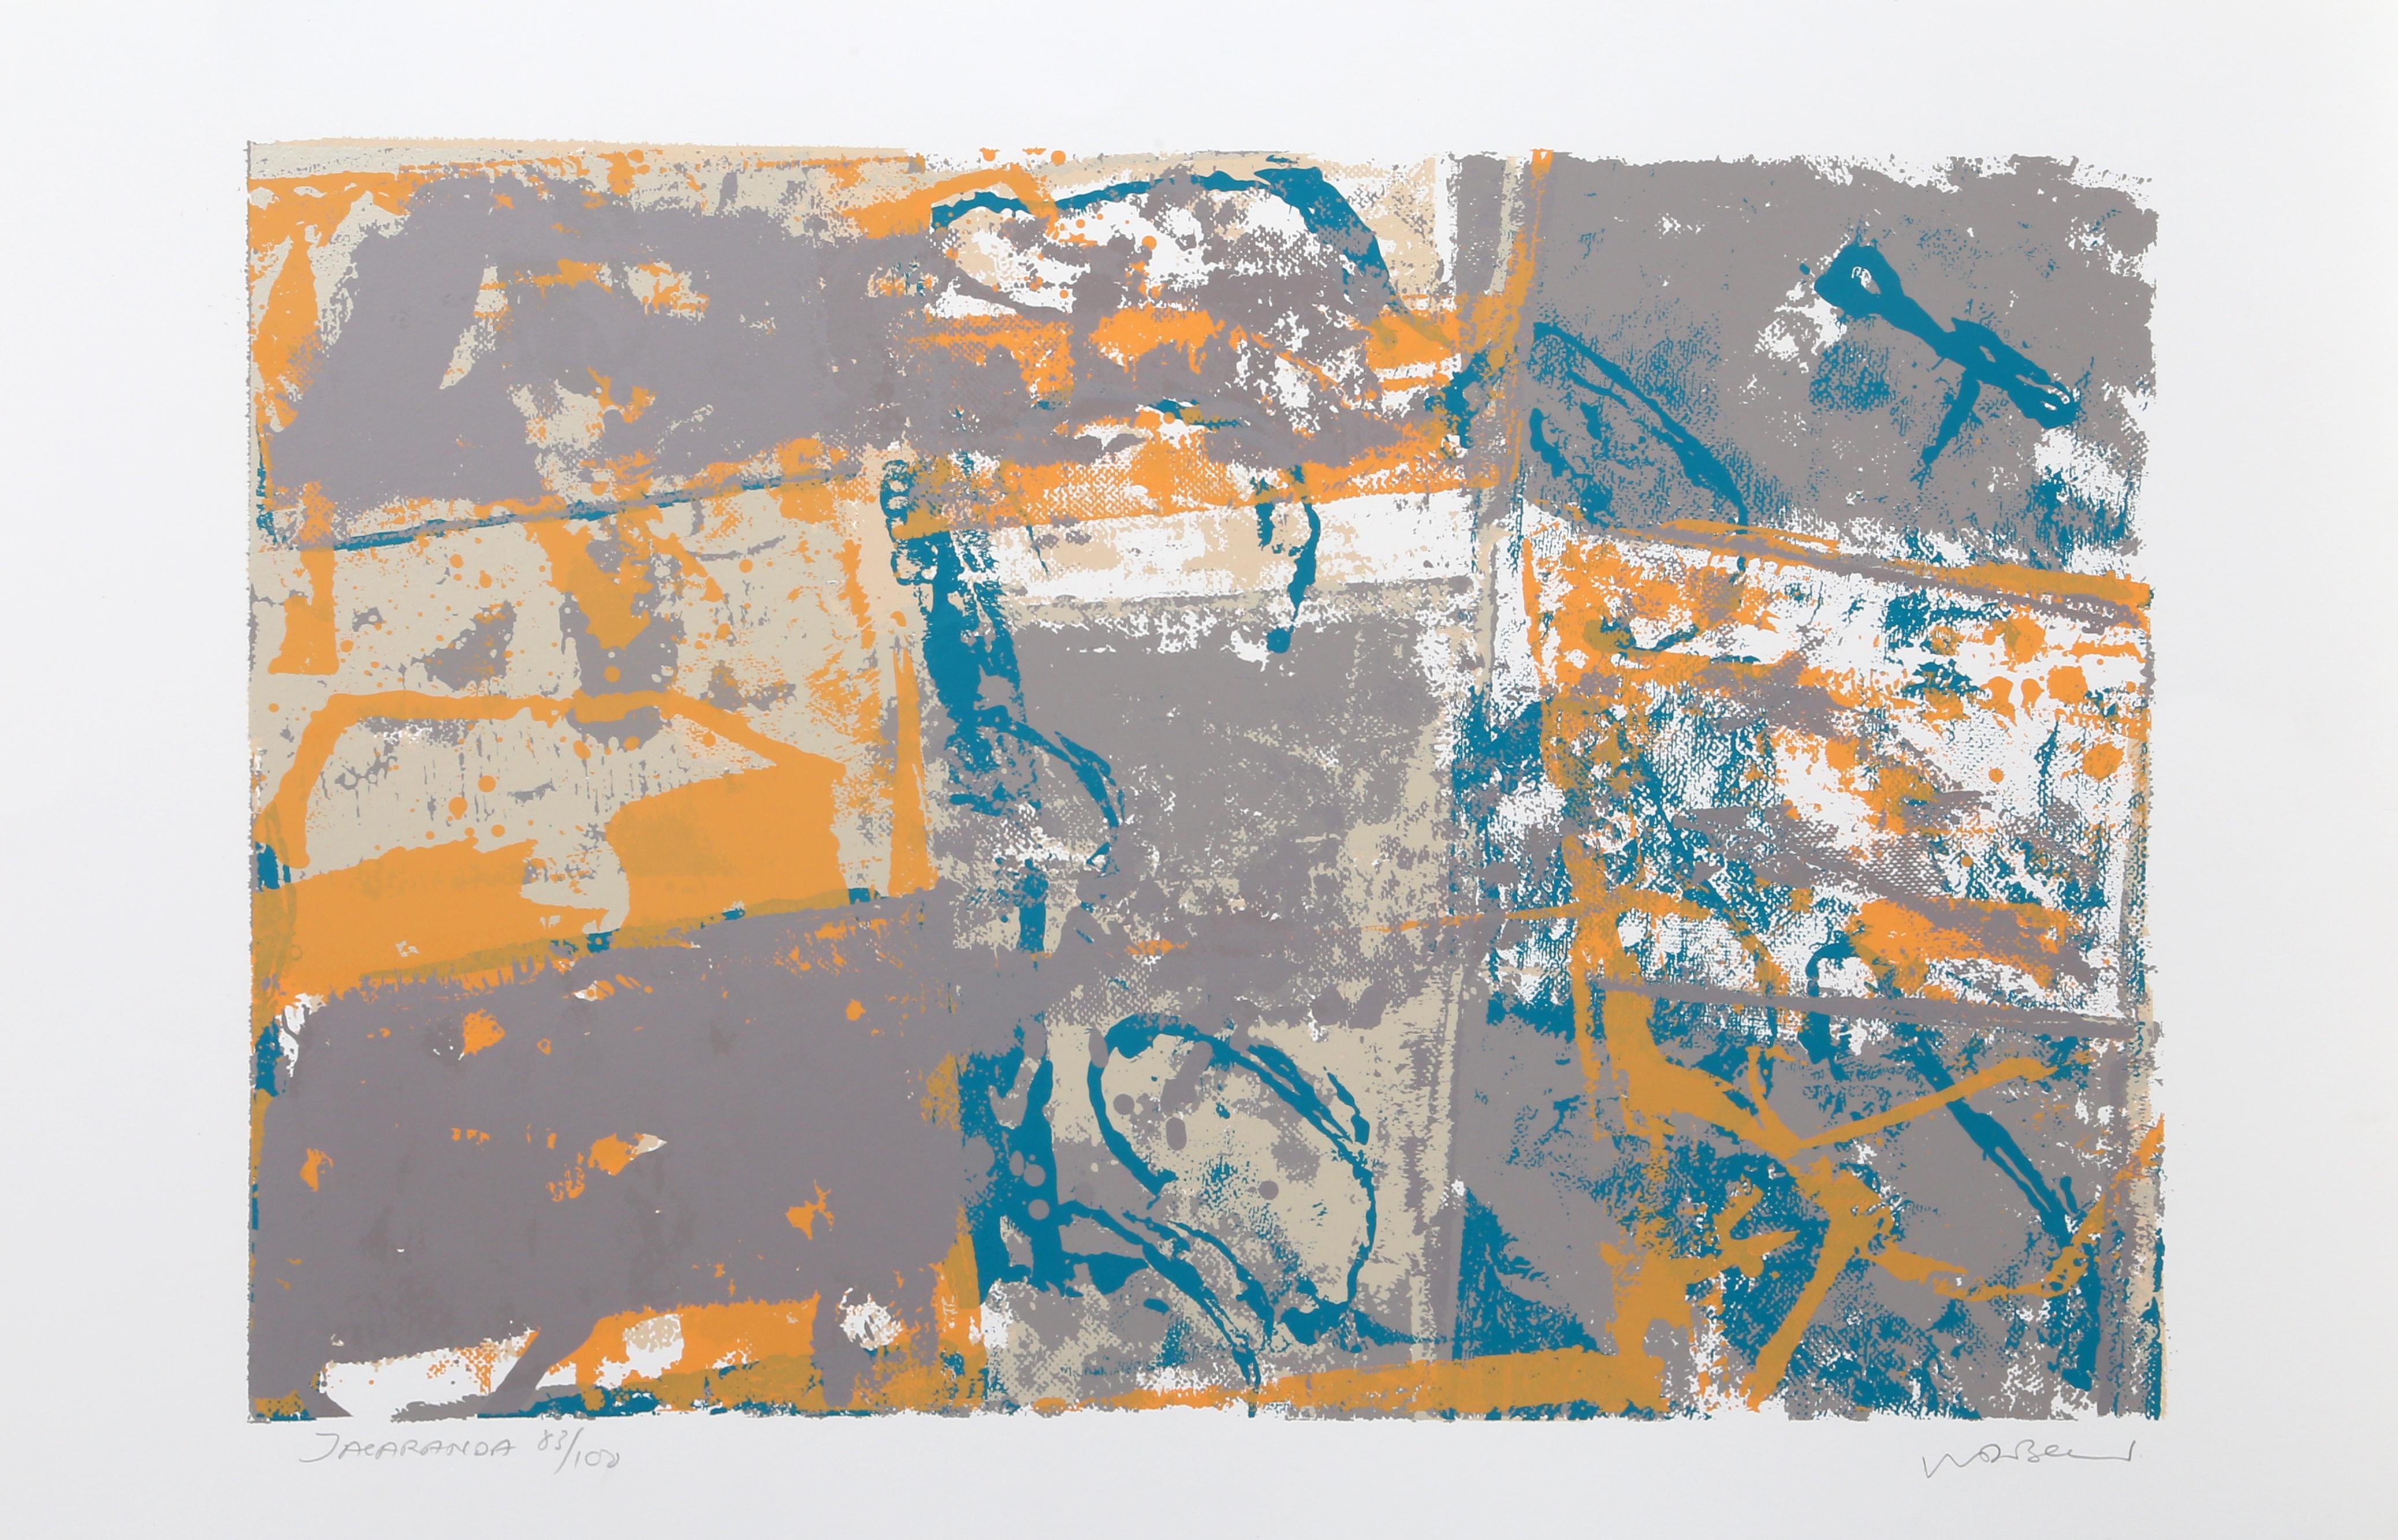 Jacaranda, Abstract Silkscreen by Walter Darby Bannard